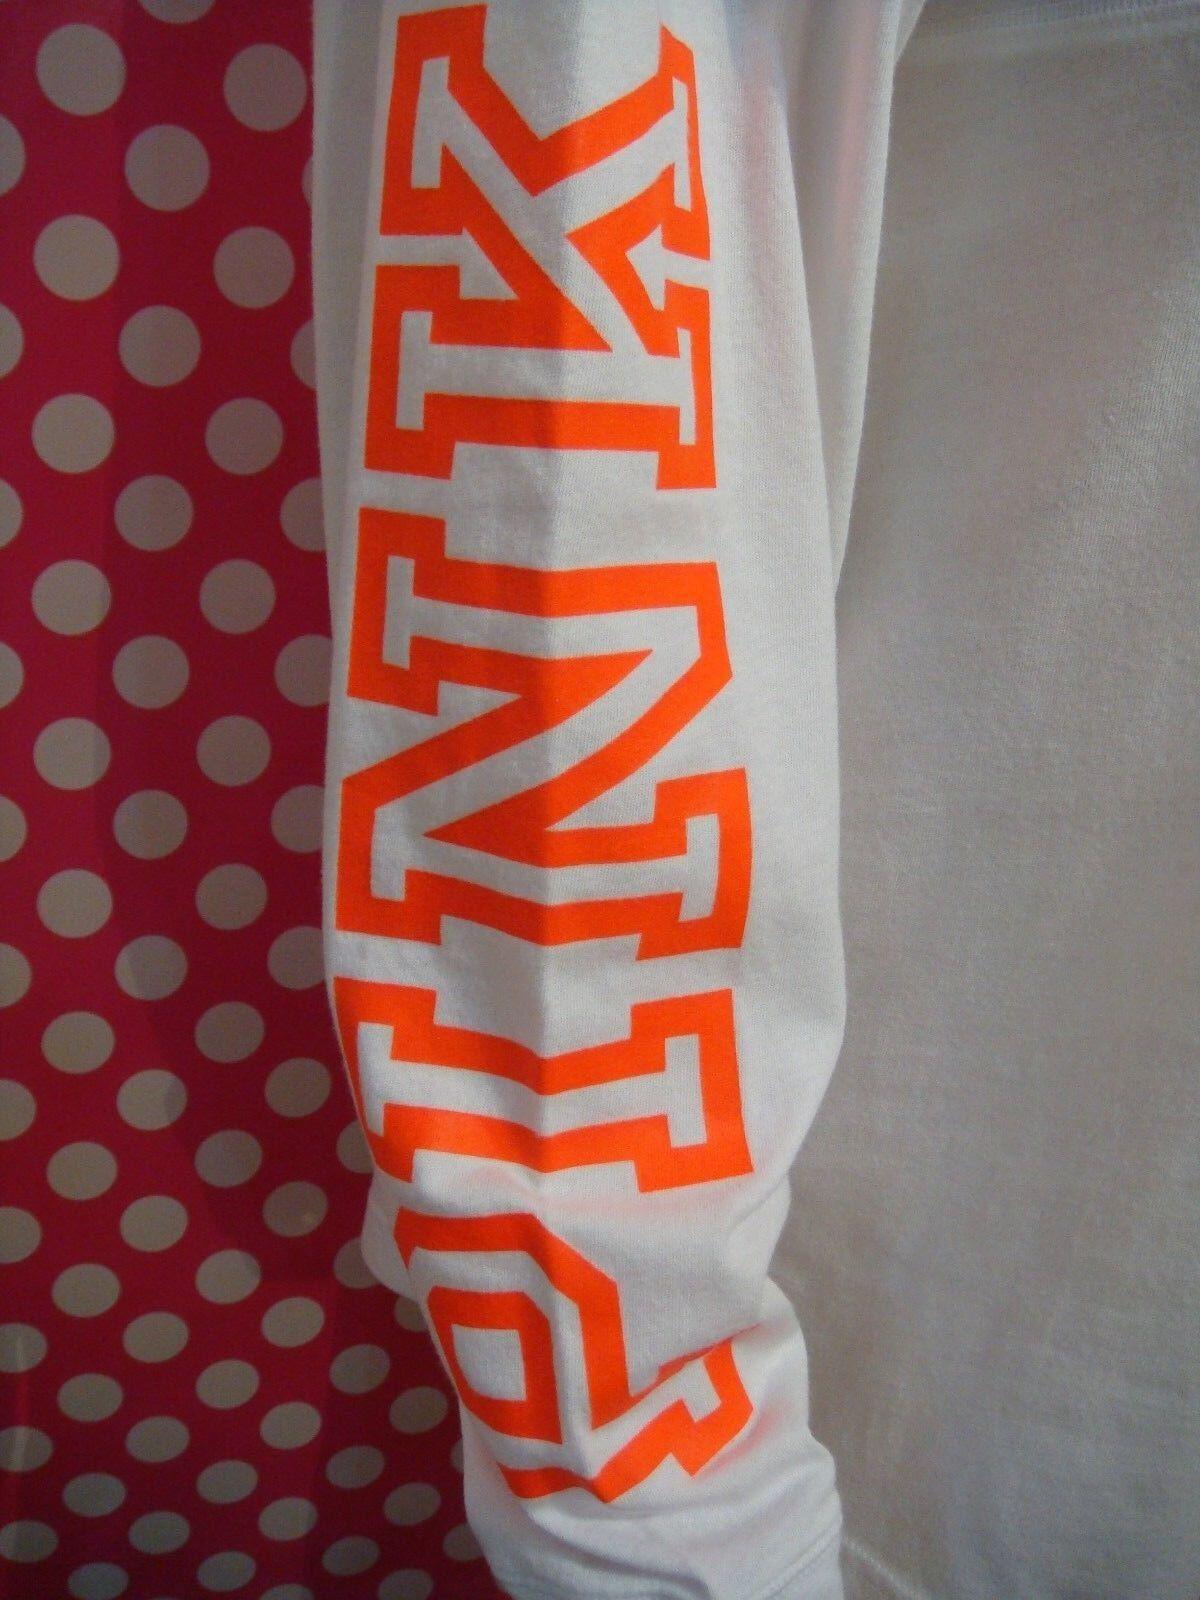 VICTORIA'S SECRET PINK PINK PINK WHITE NEON orange LONG SLEEVE VERSITY T-SHIRT HOODIE XS aba42d